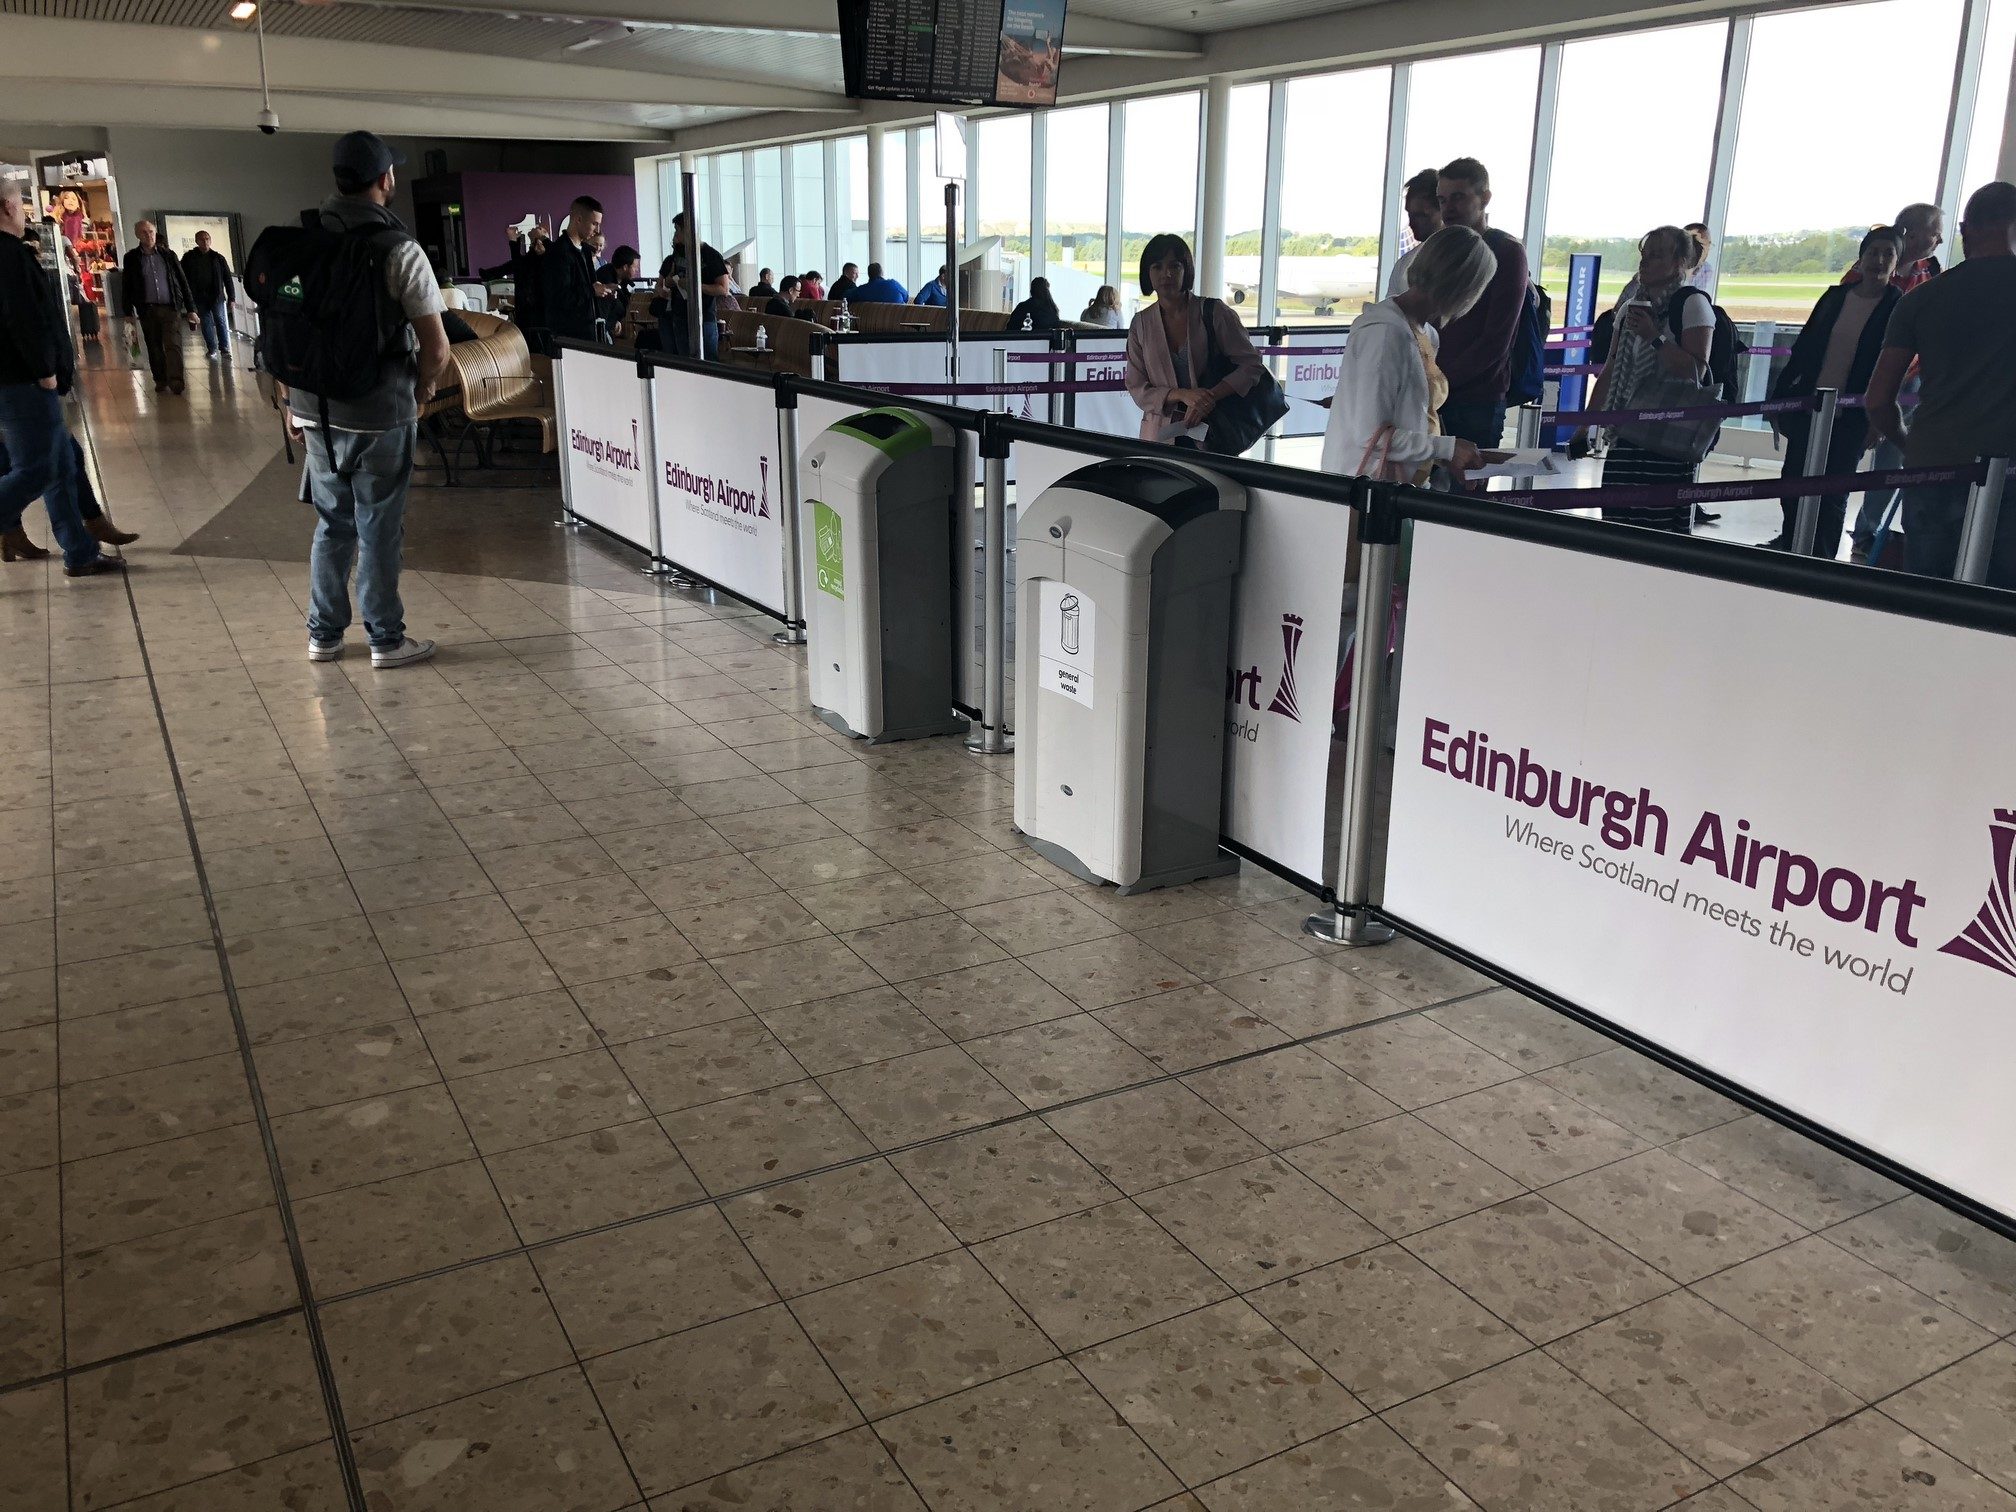 9 Edinburgh Airport